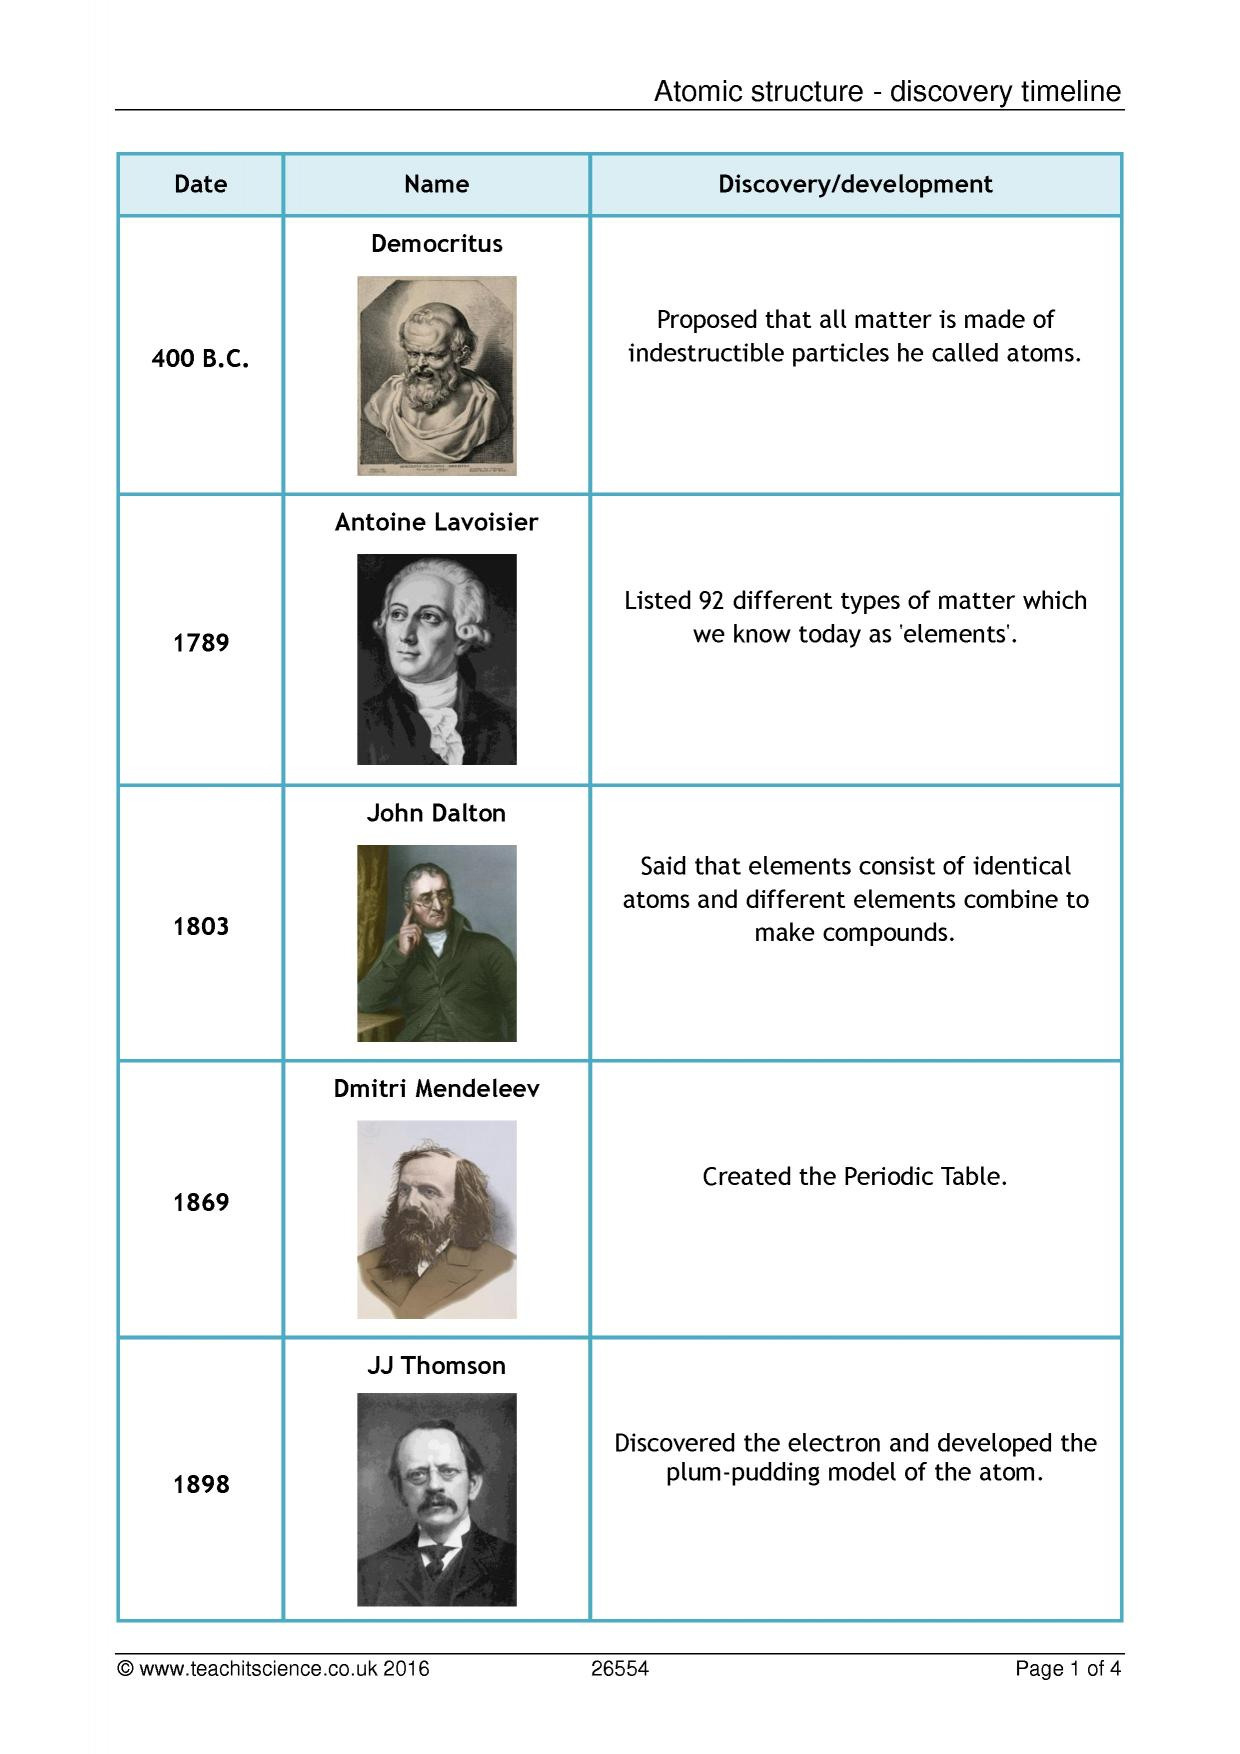 Atomic Theory Timeline Worksheet Db Excel